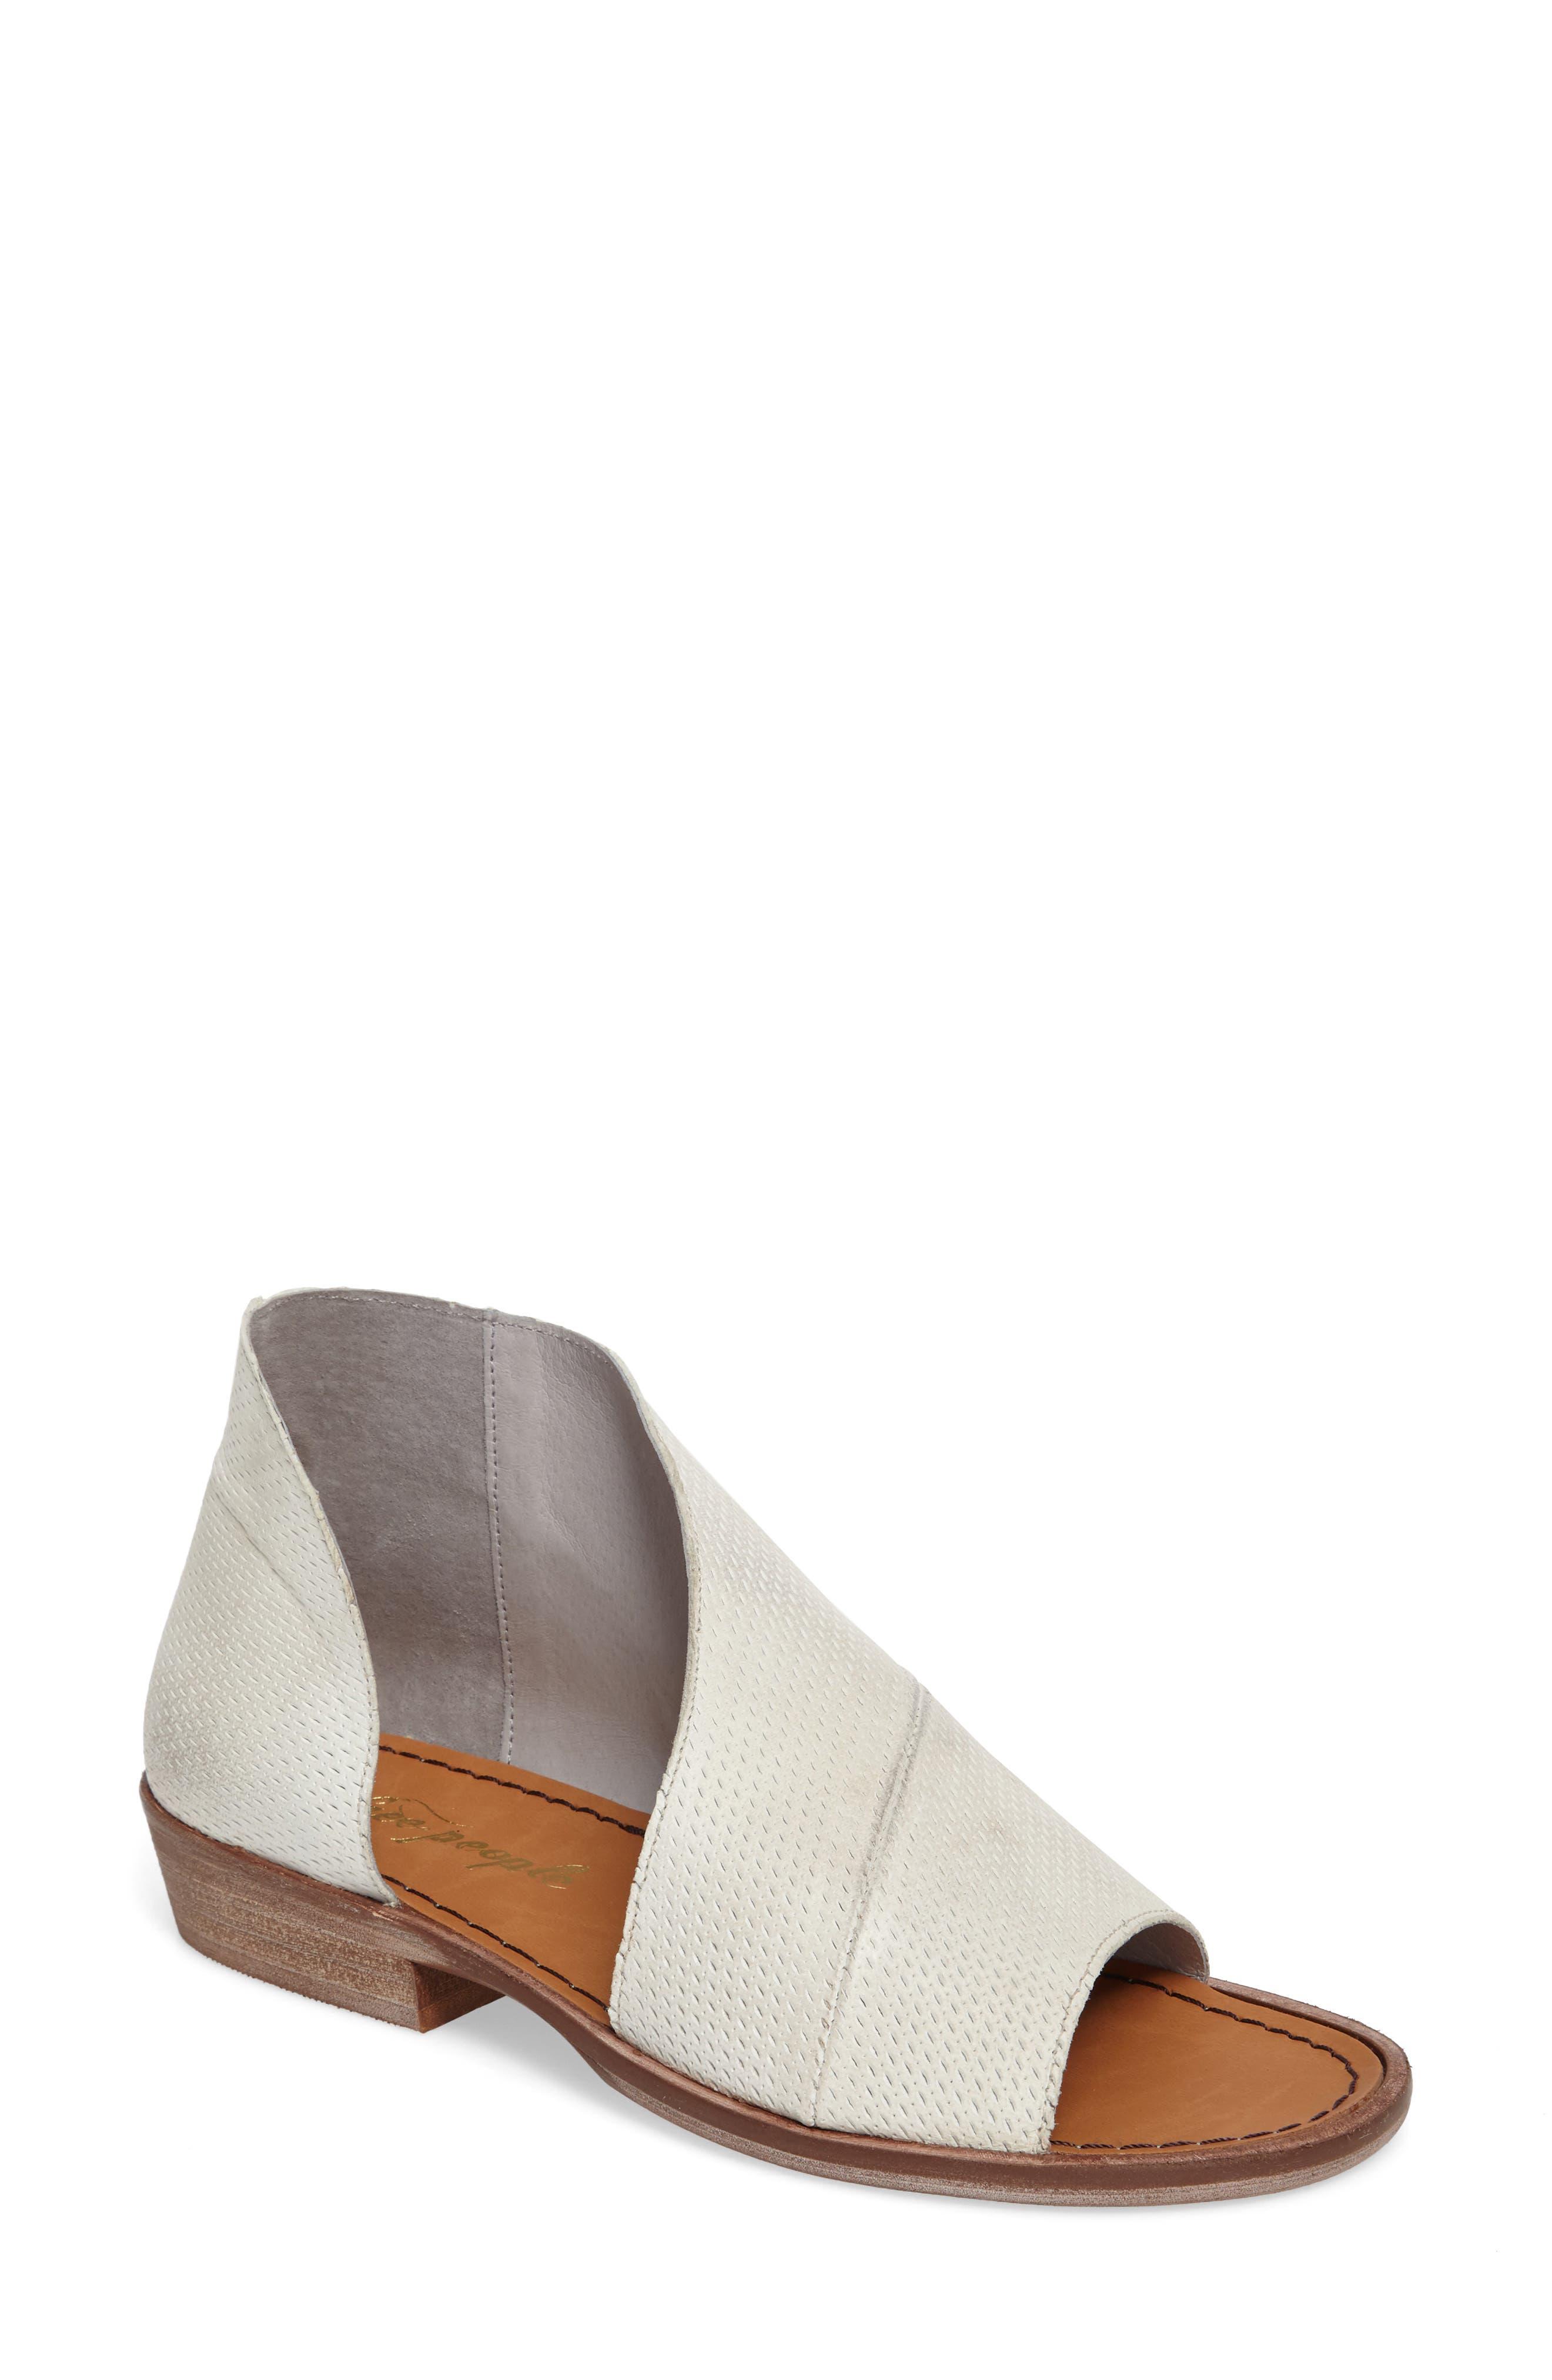 'Mont Blanc' Asymmetrical Sandal,                             Main thumbnail 9, color,